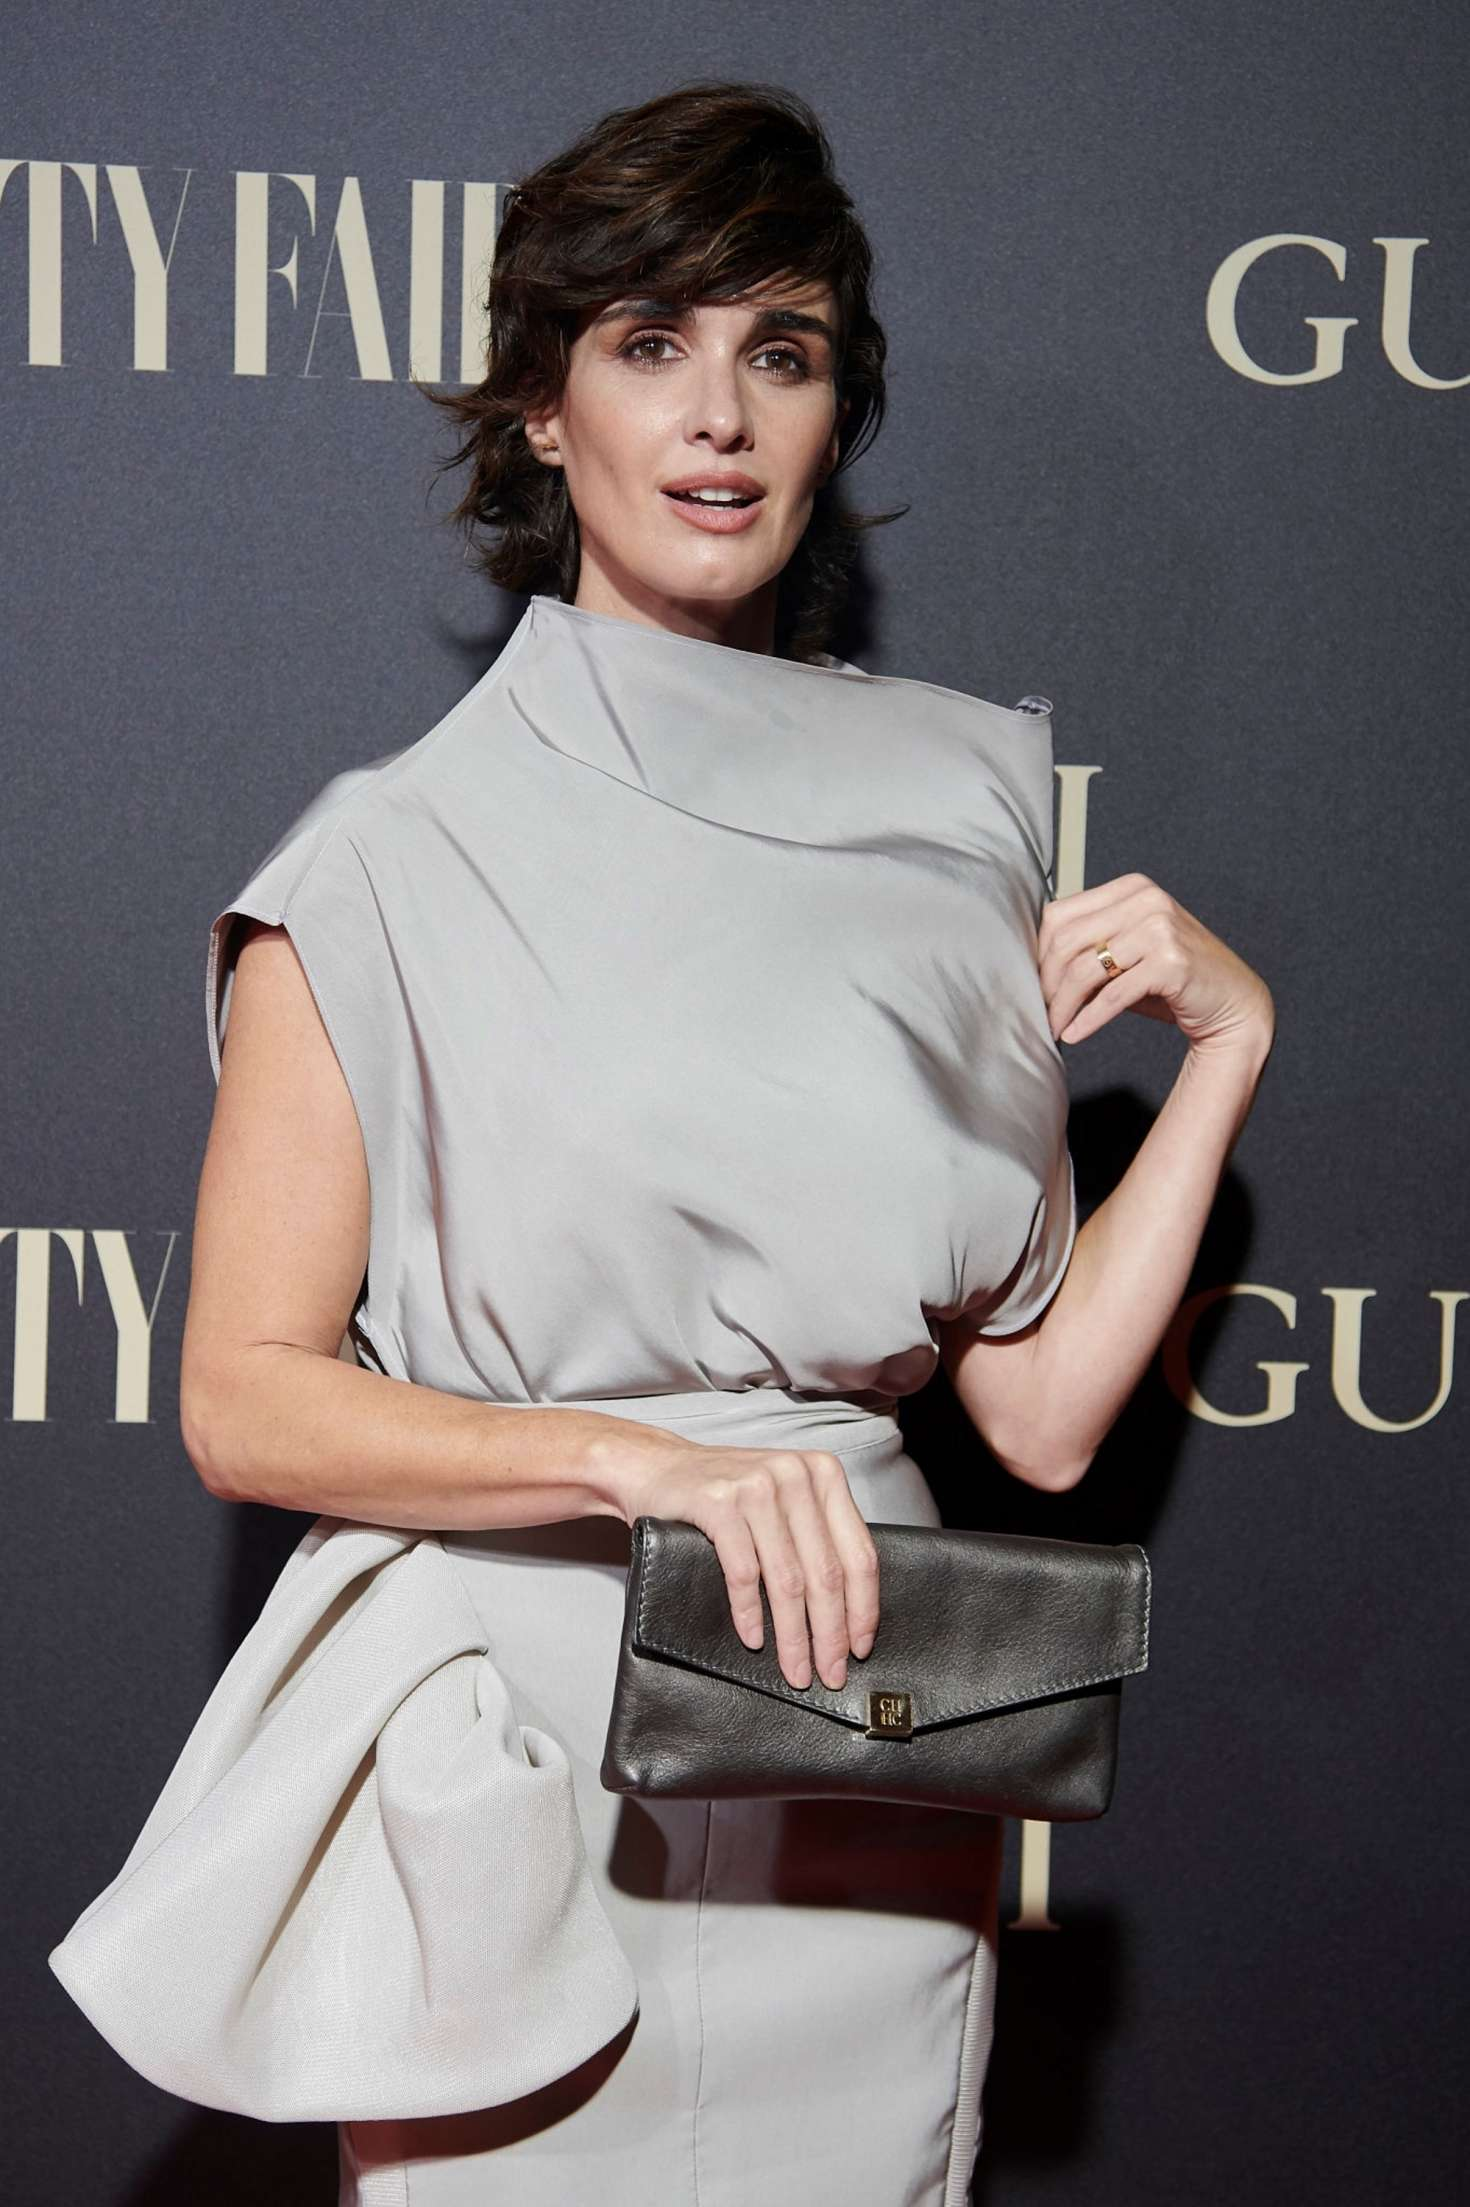 Paz Vega - Vanity Fair Personality of the Year Awards 2018 in Madrid